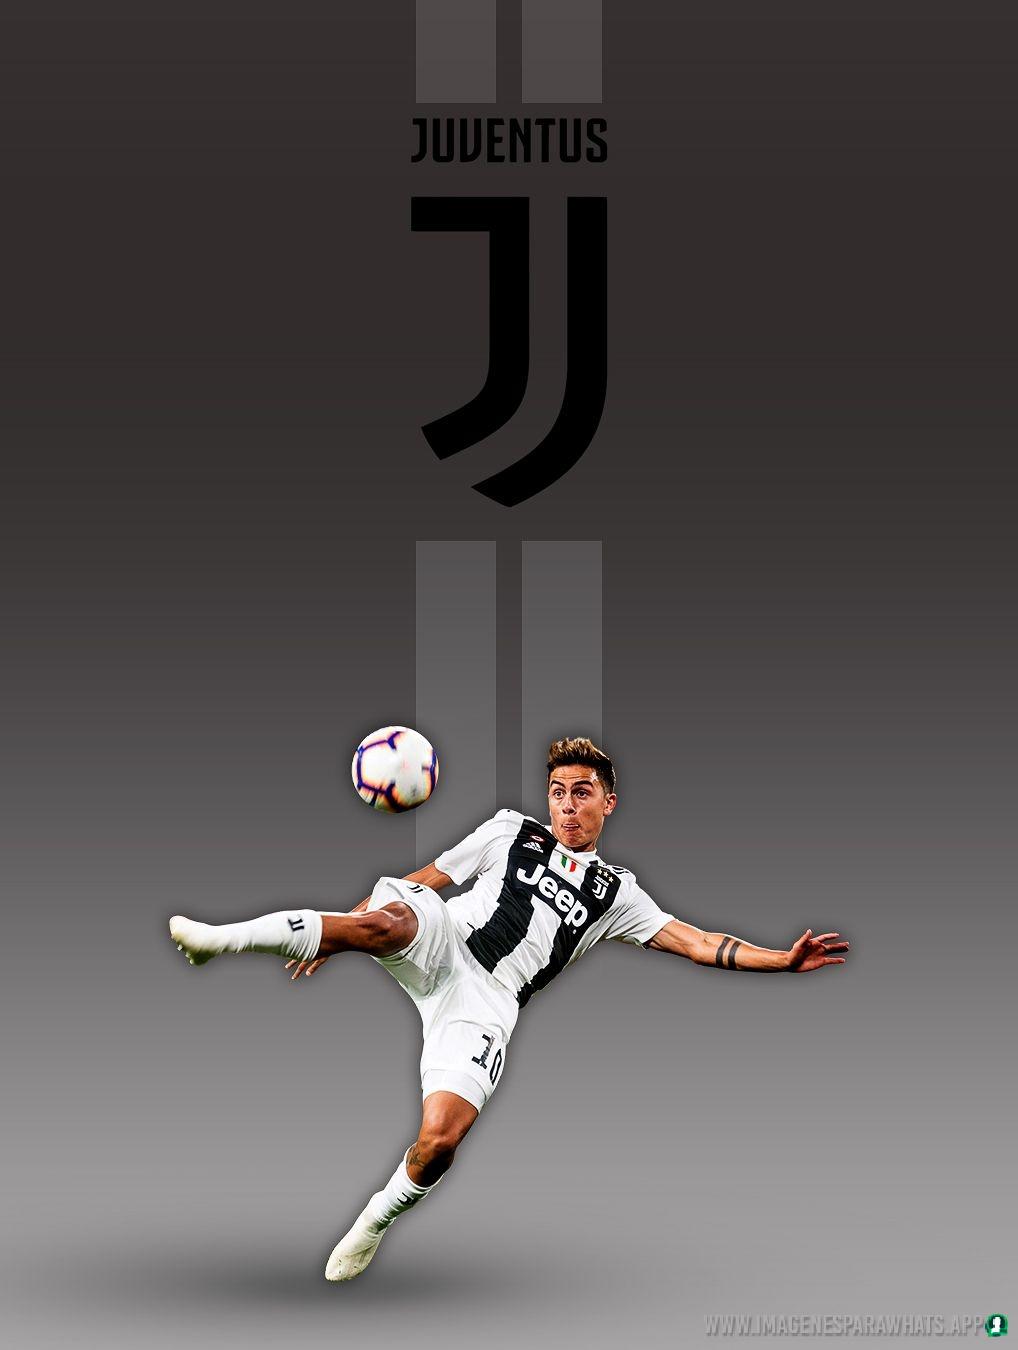 Imagenes de Futbol (1150)